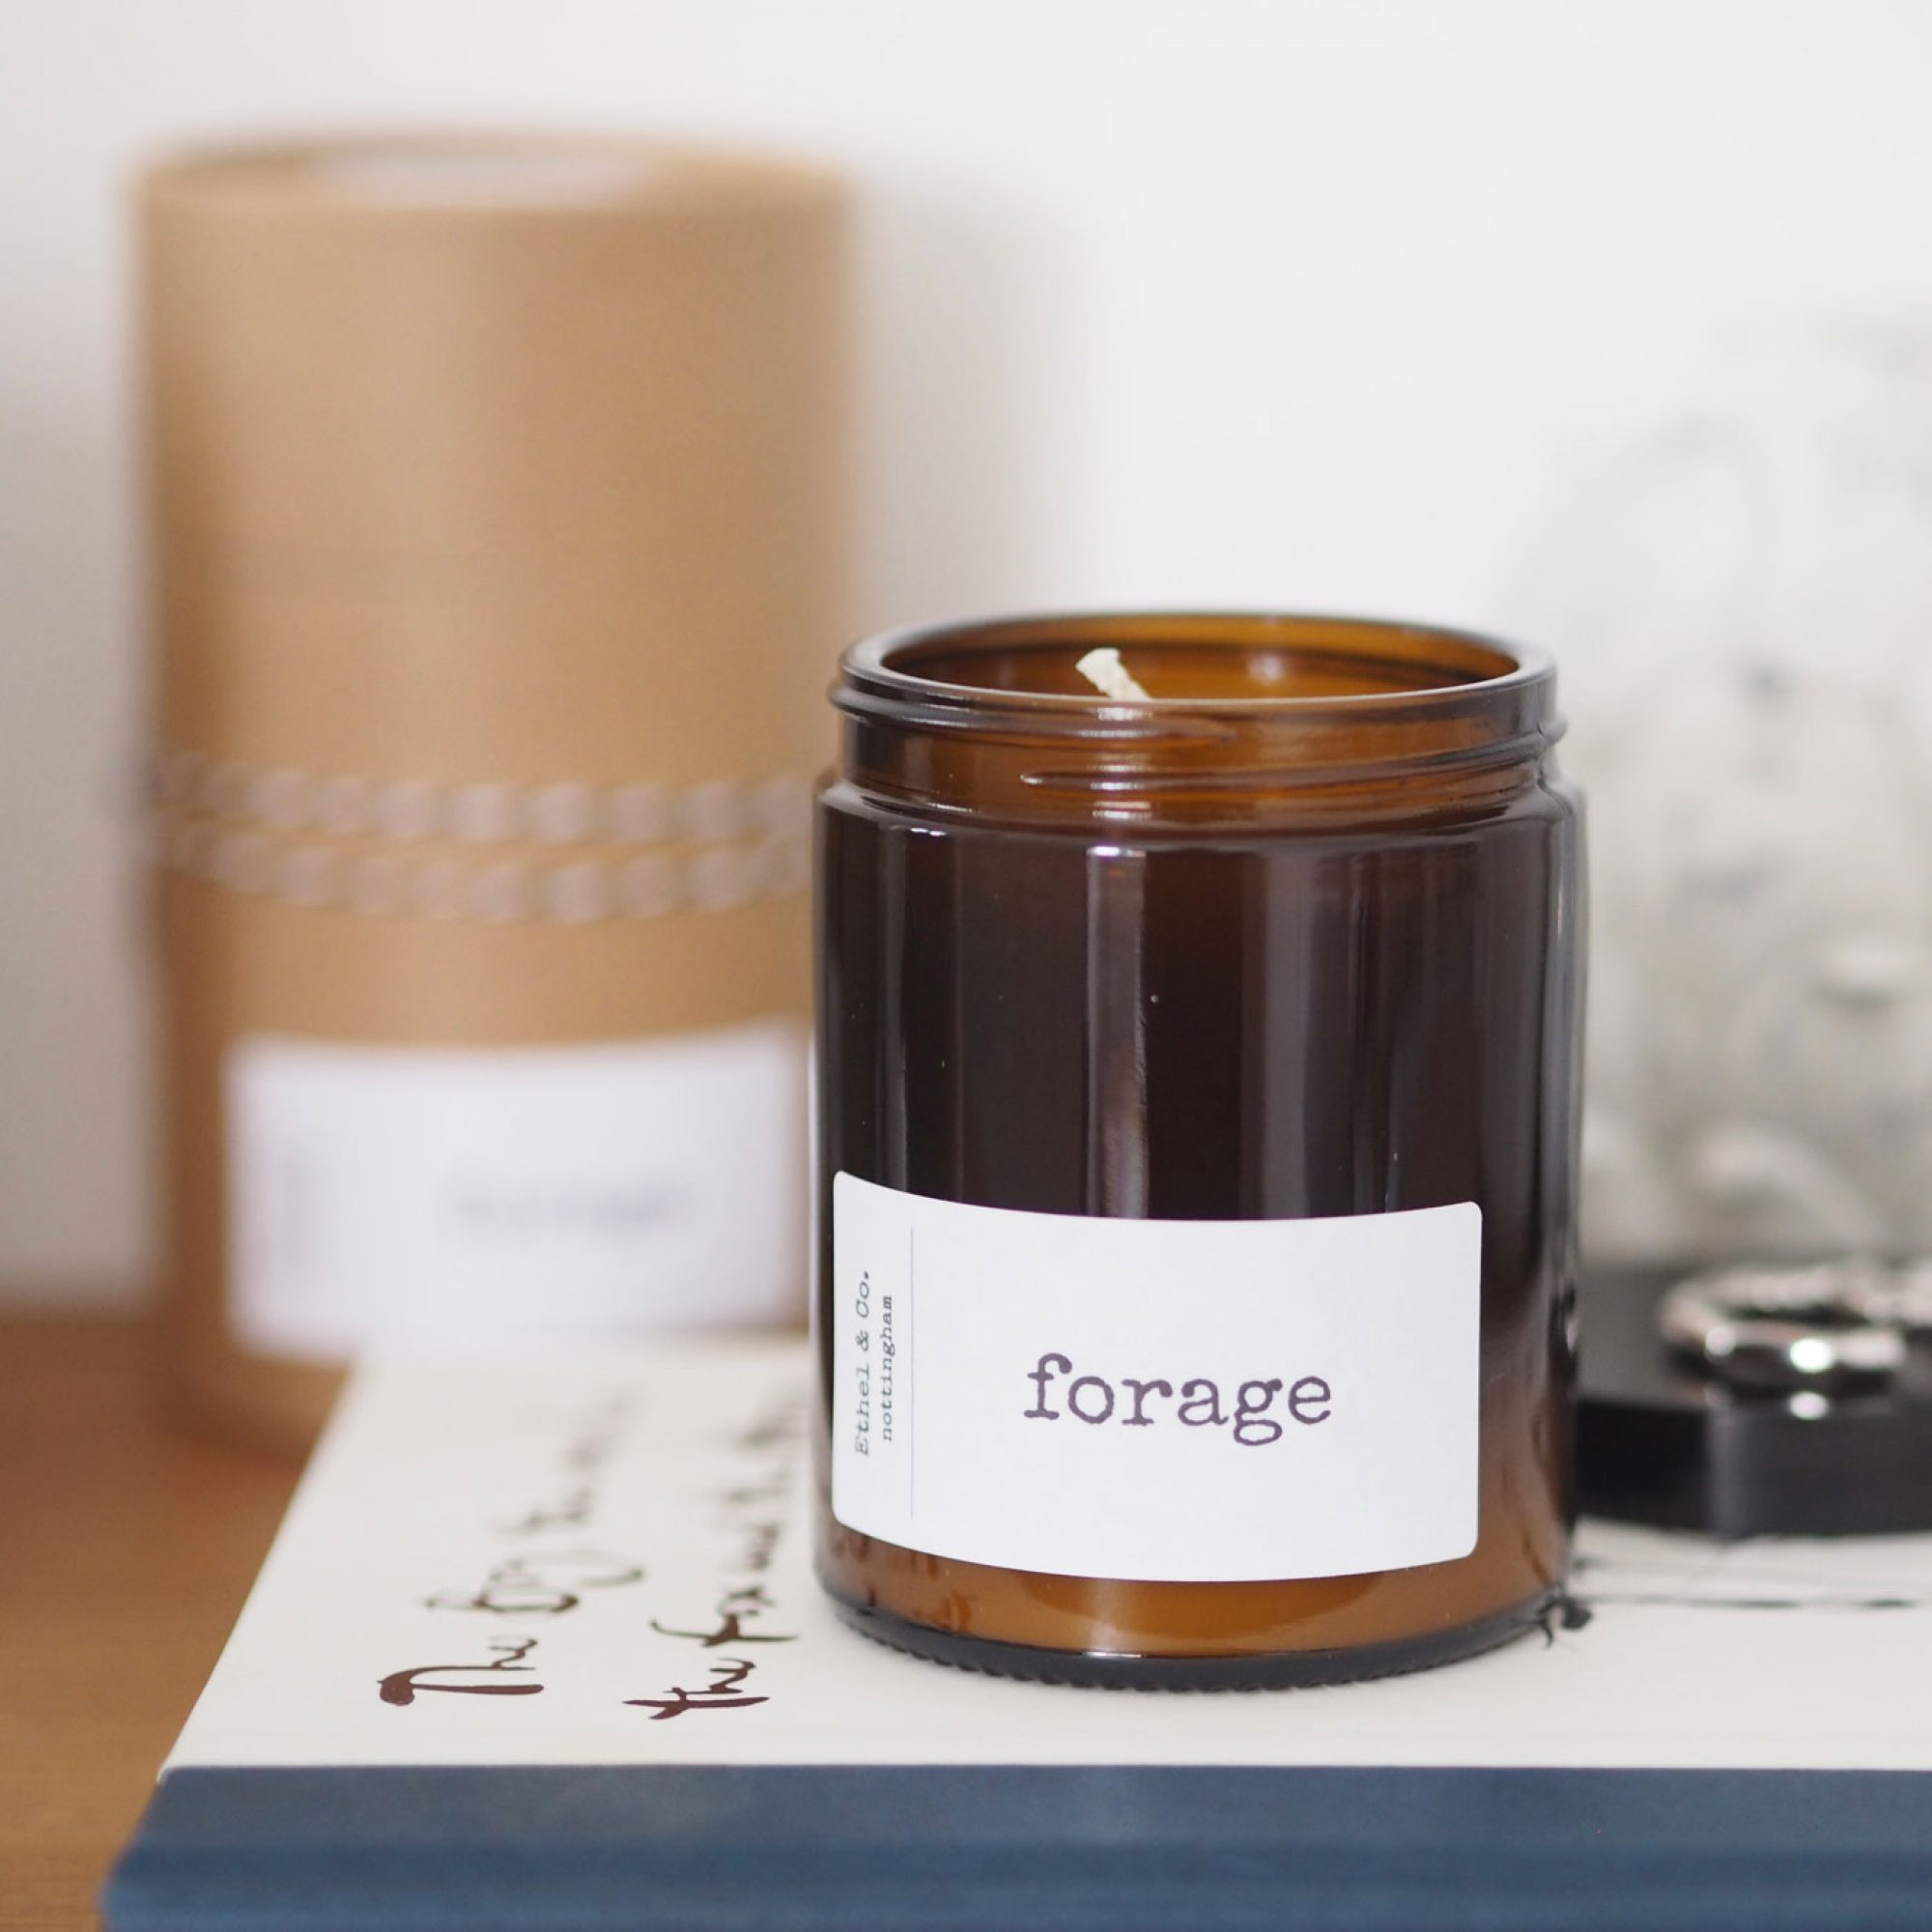 Forage - Springtime Candle